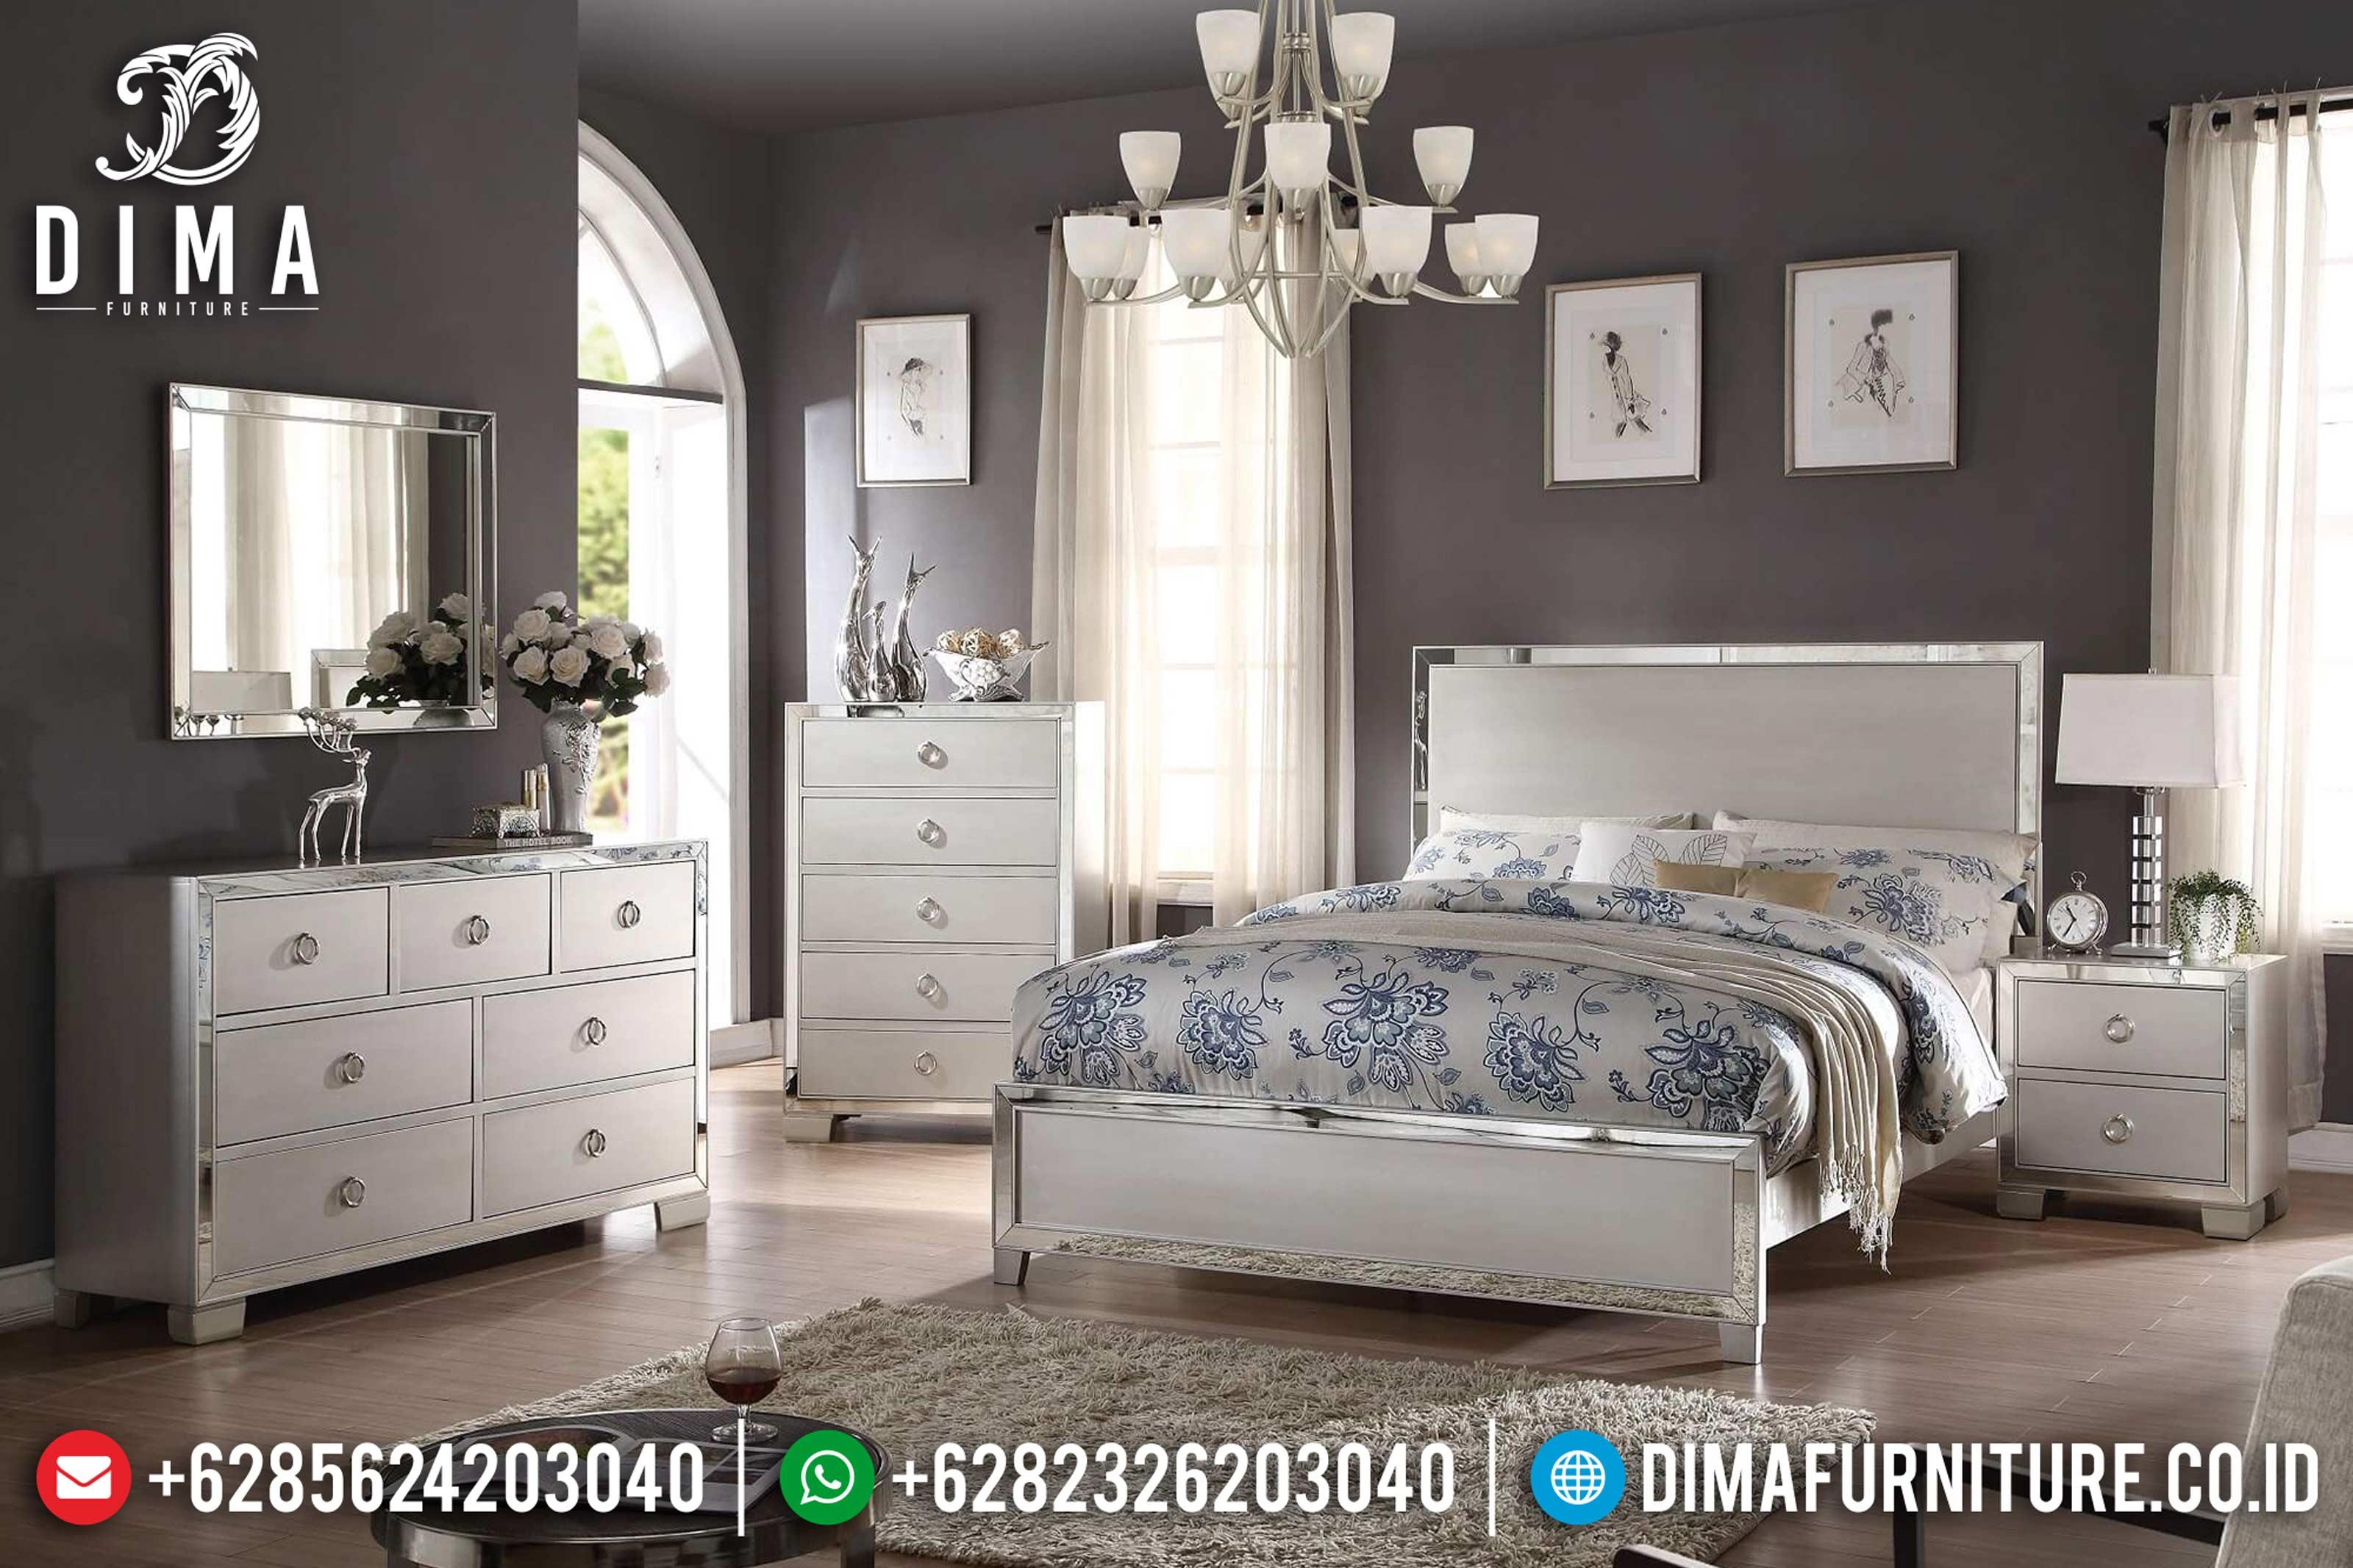 Platinum Bedroom Set Voeville Tempat Tidur Jepara Minimalis Mewah DF-0637